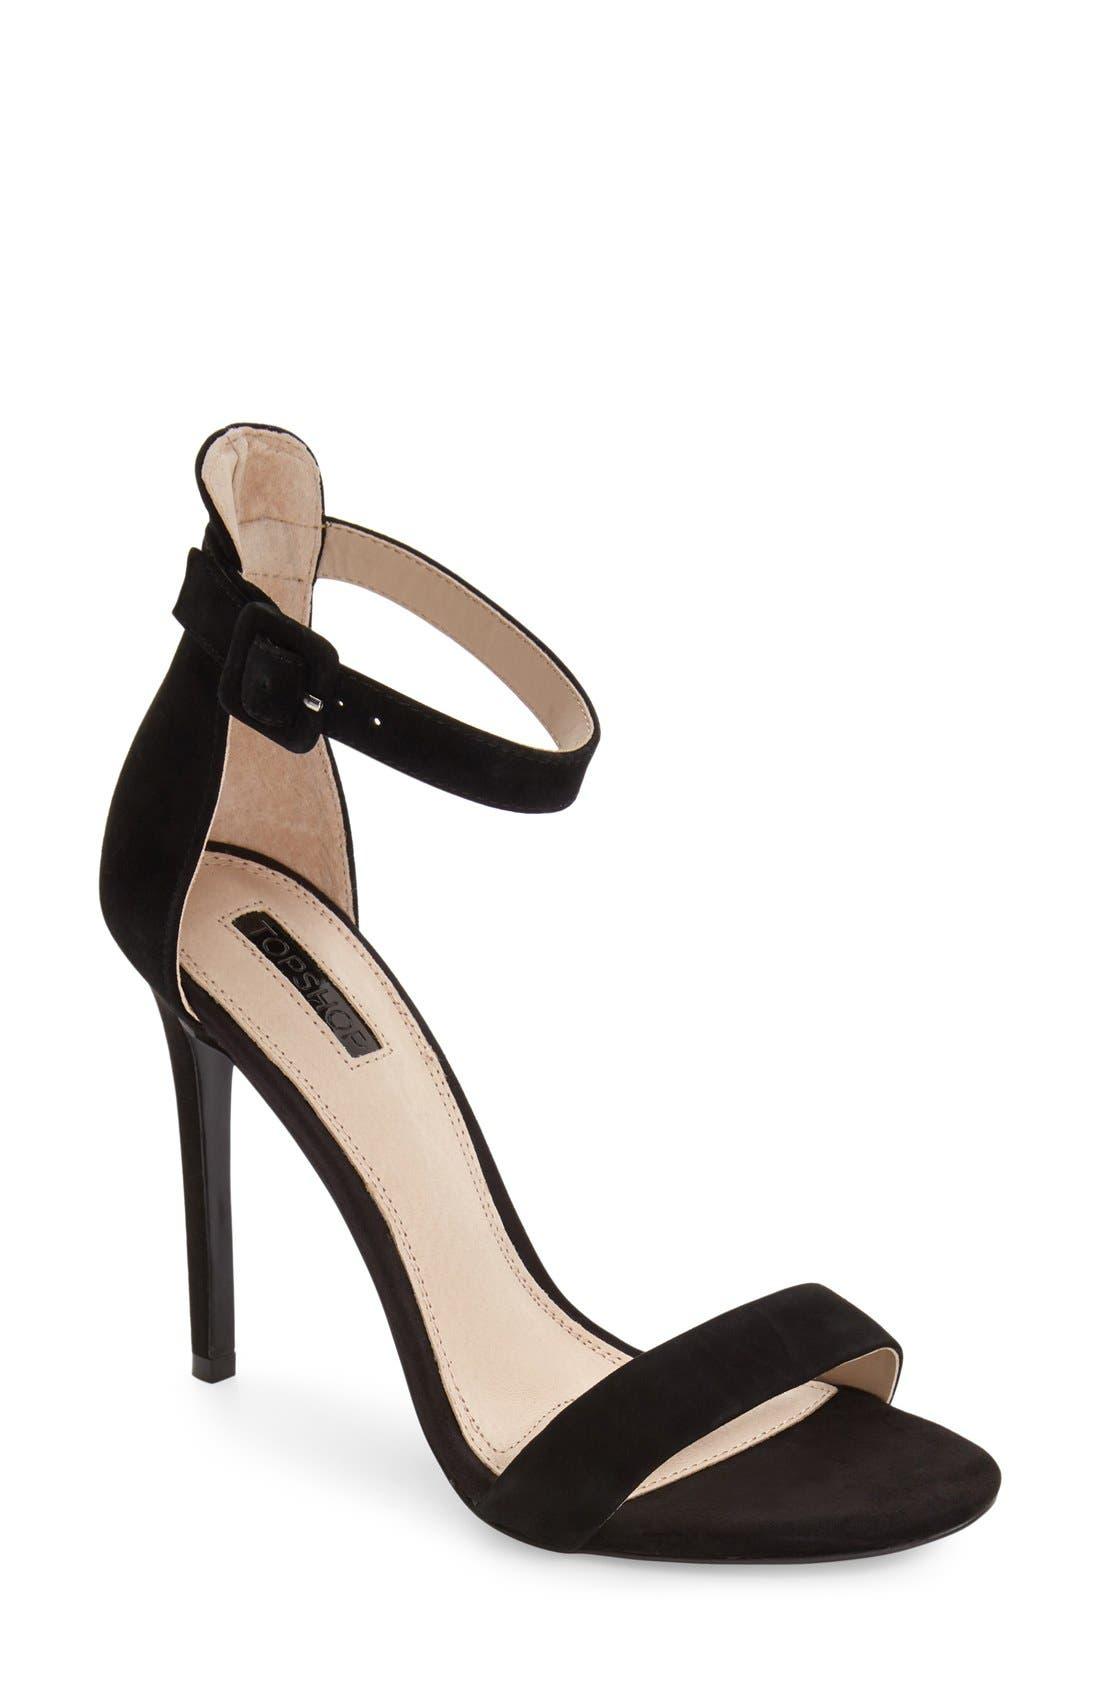 Alternate Image 1 Selected - Topshop 'Rita' Ankle Strap Sandal (Women)